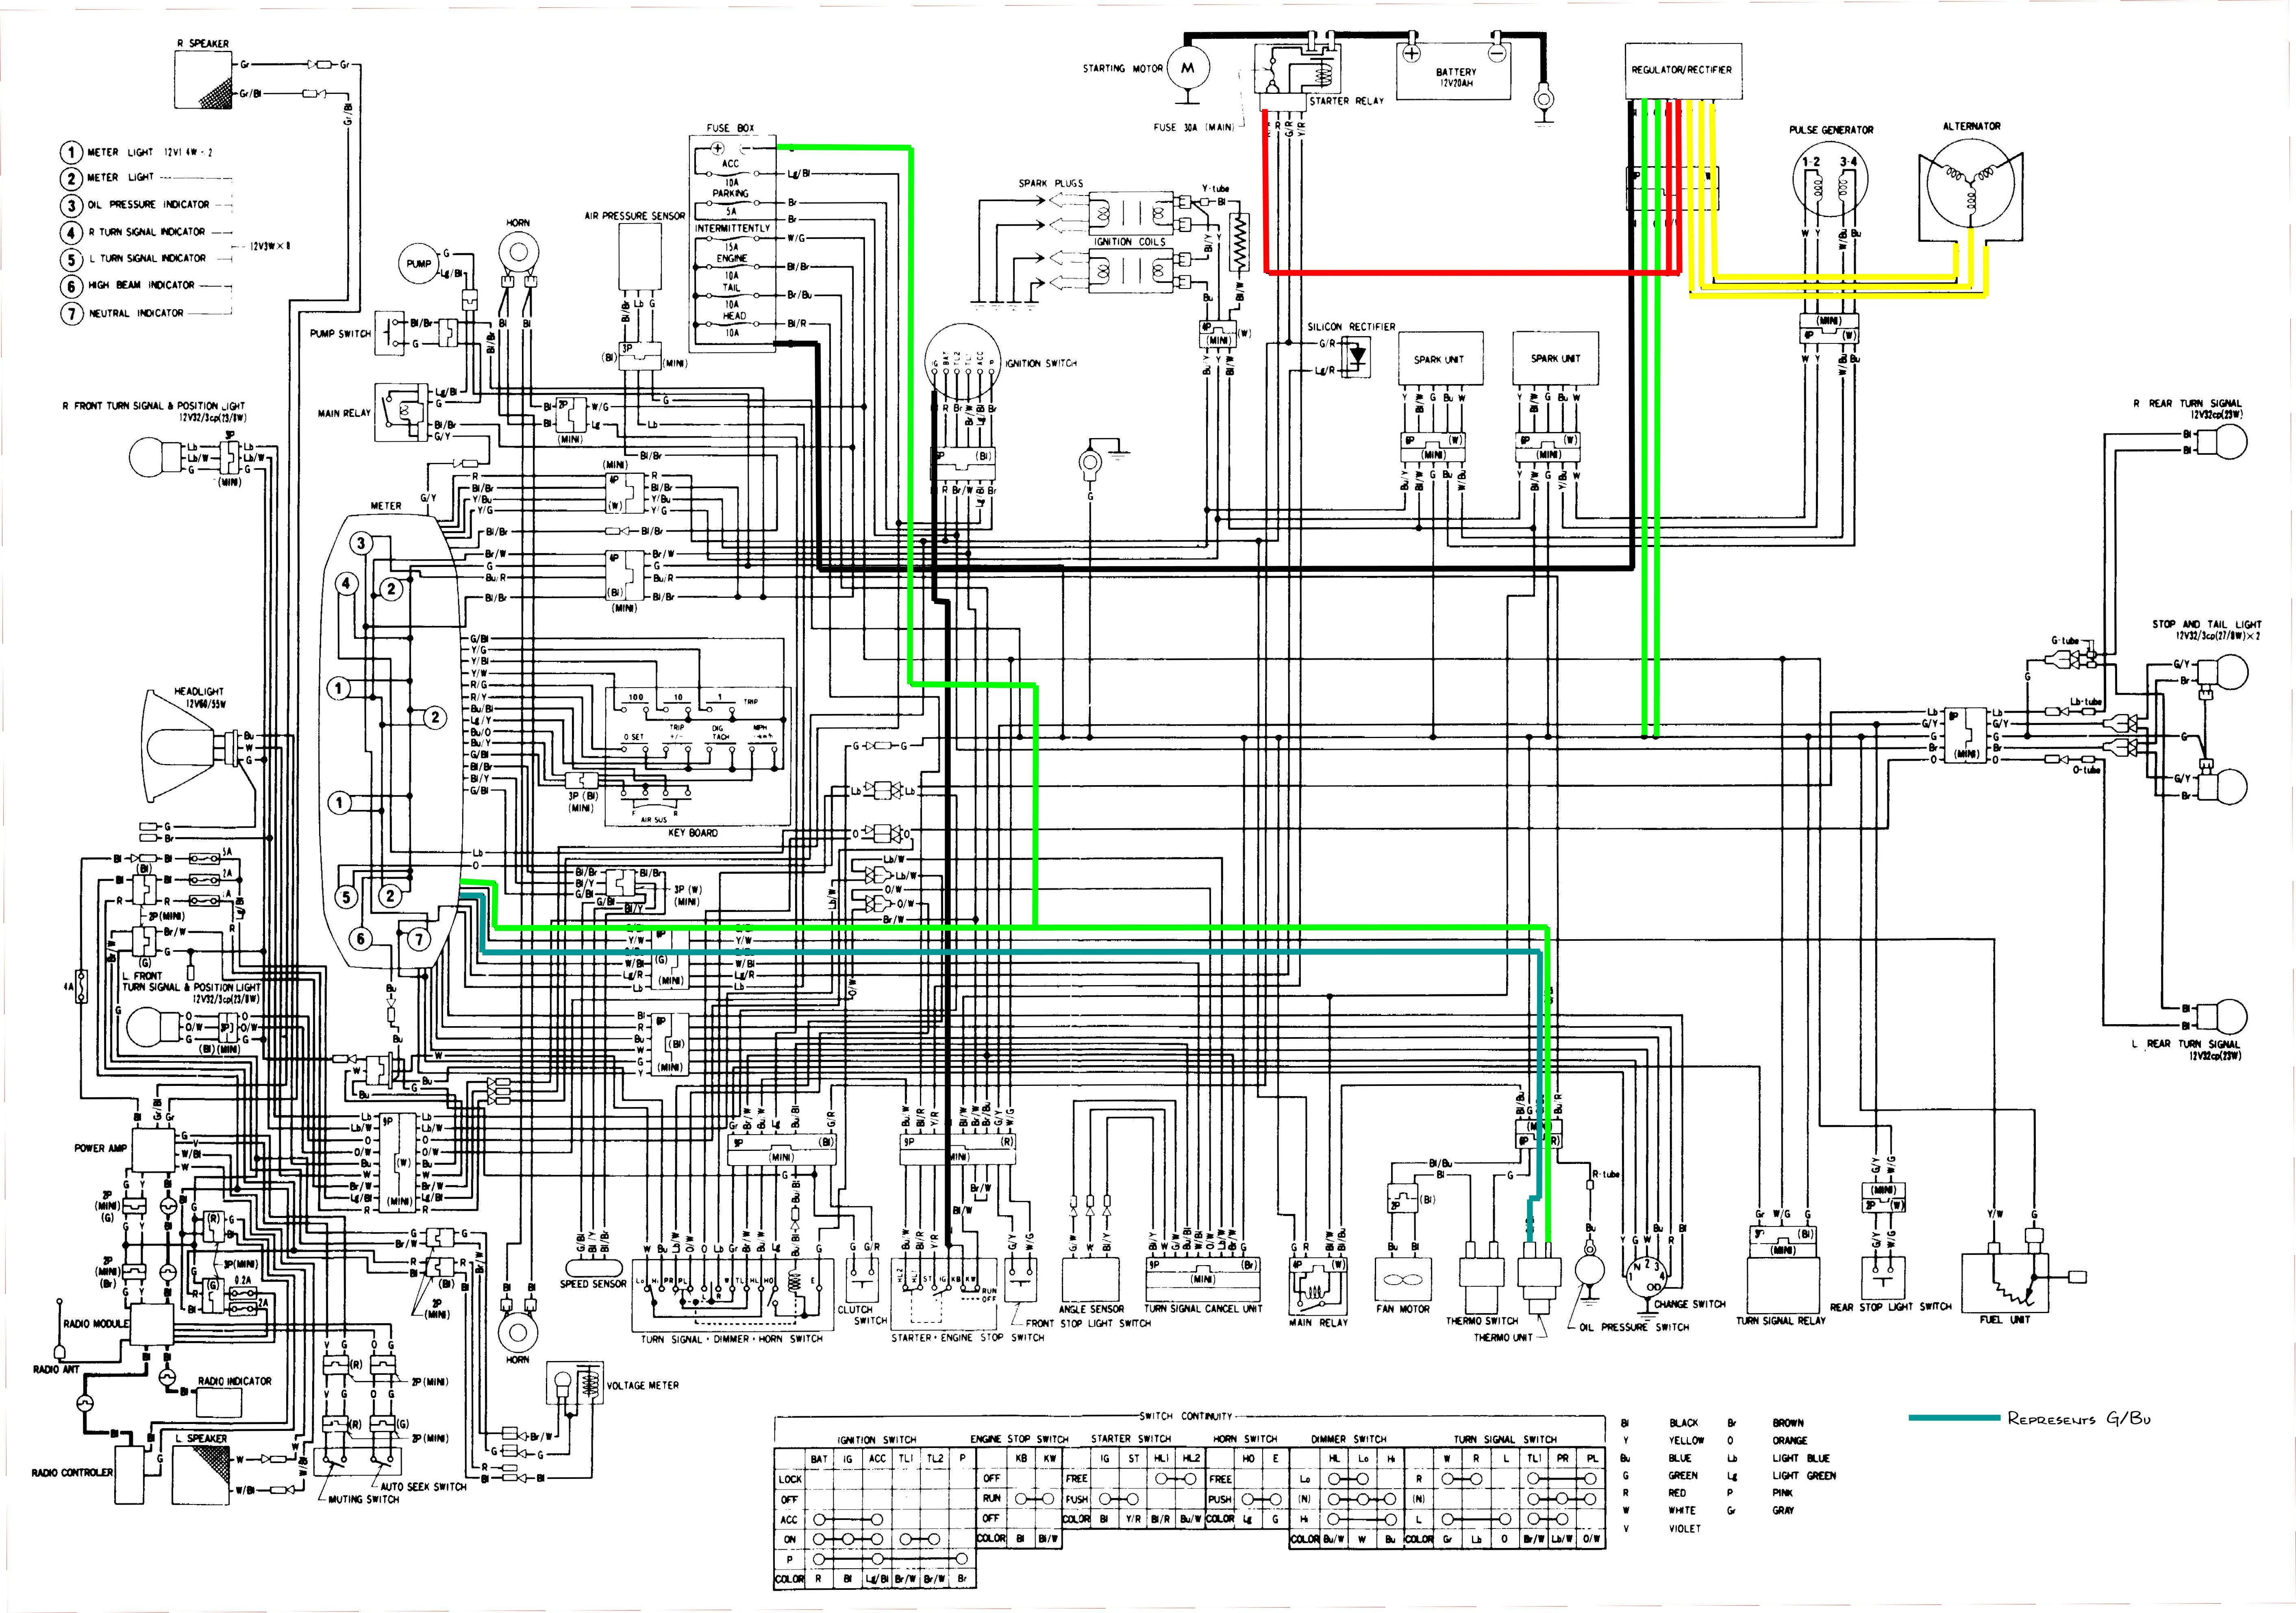 honda goldwing wiring blueprint - mircophone galaxy plug wiring diagram -  engineeee-diagrams.begaya.decorresine.it  wiring diagram resource